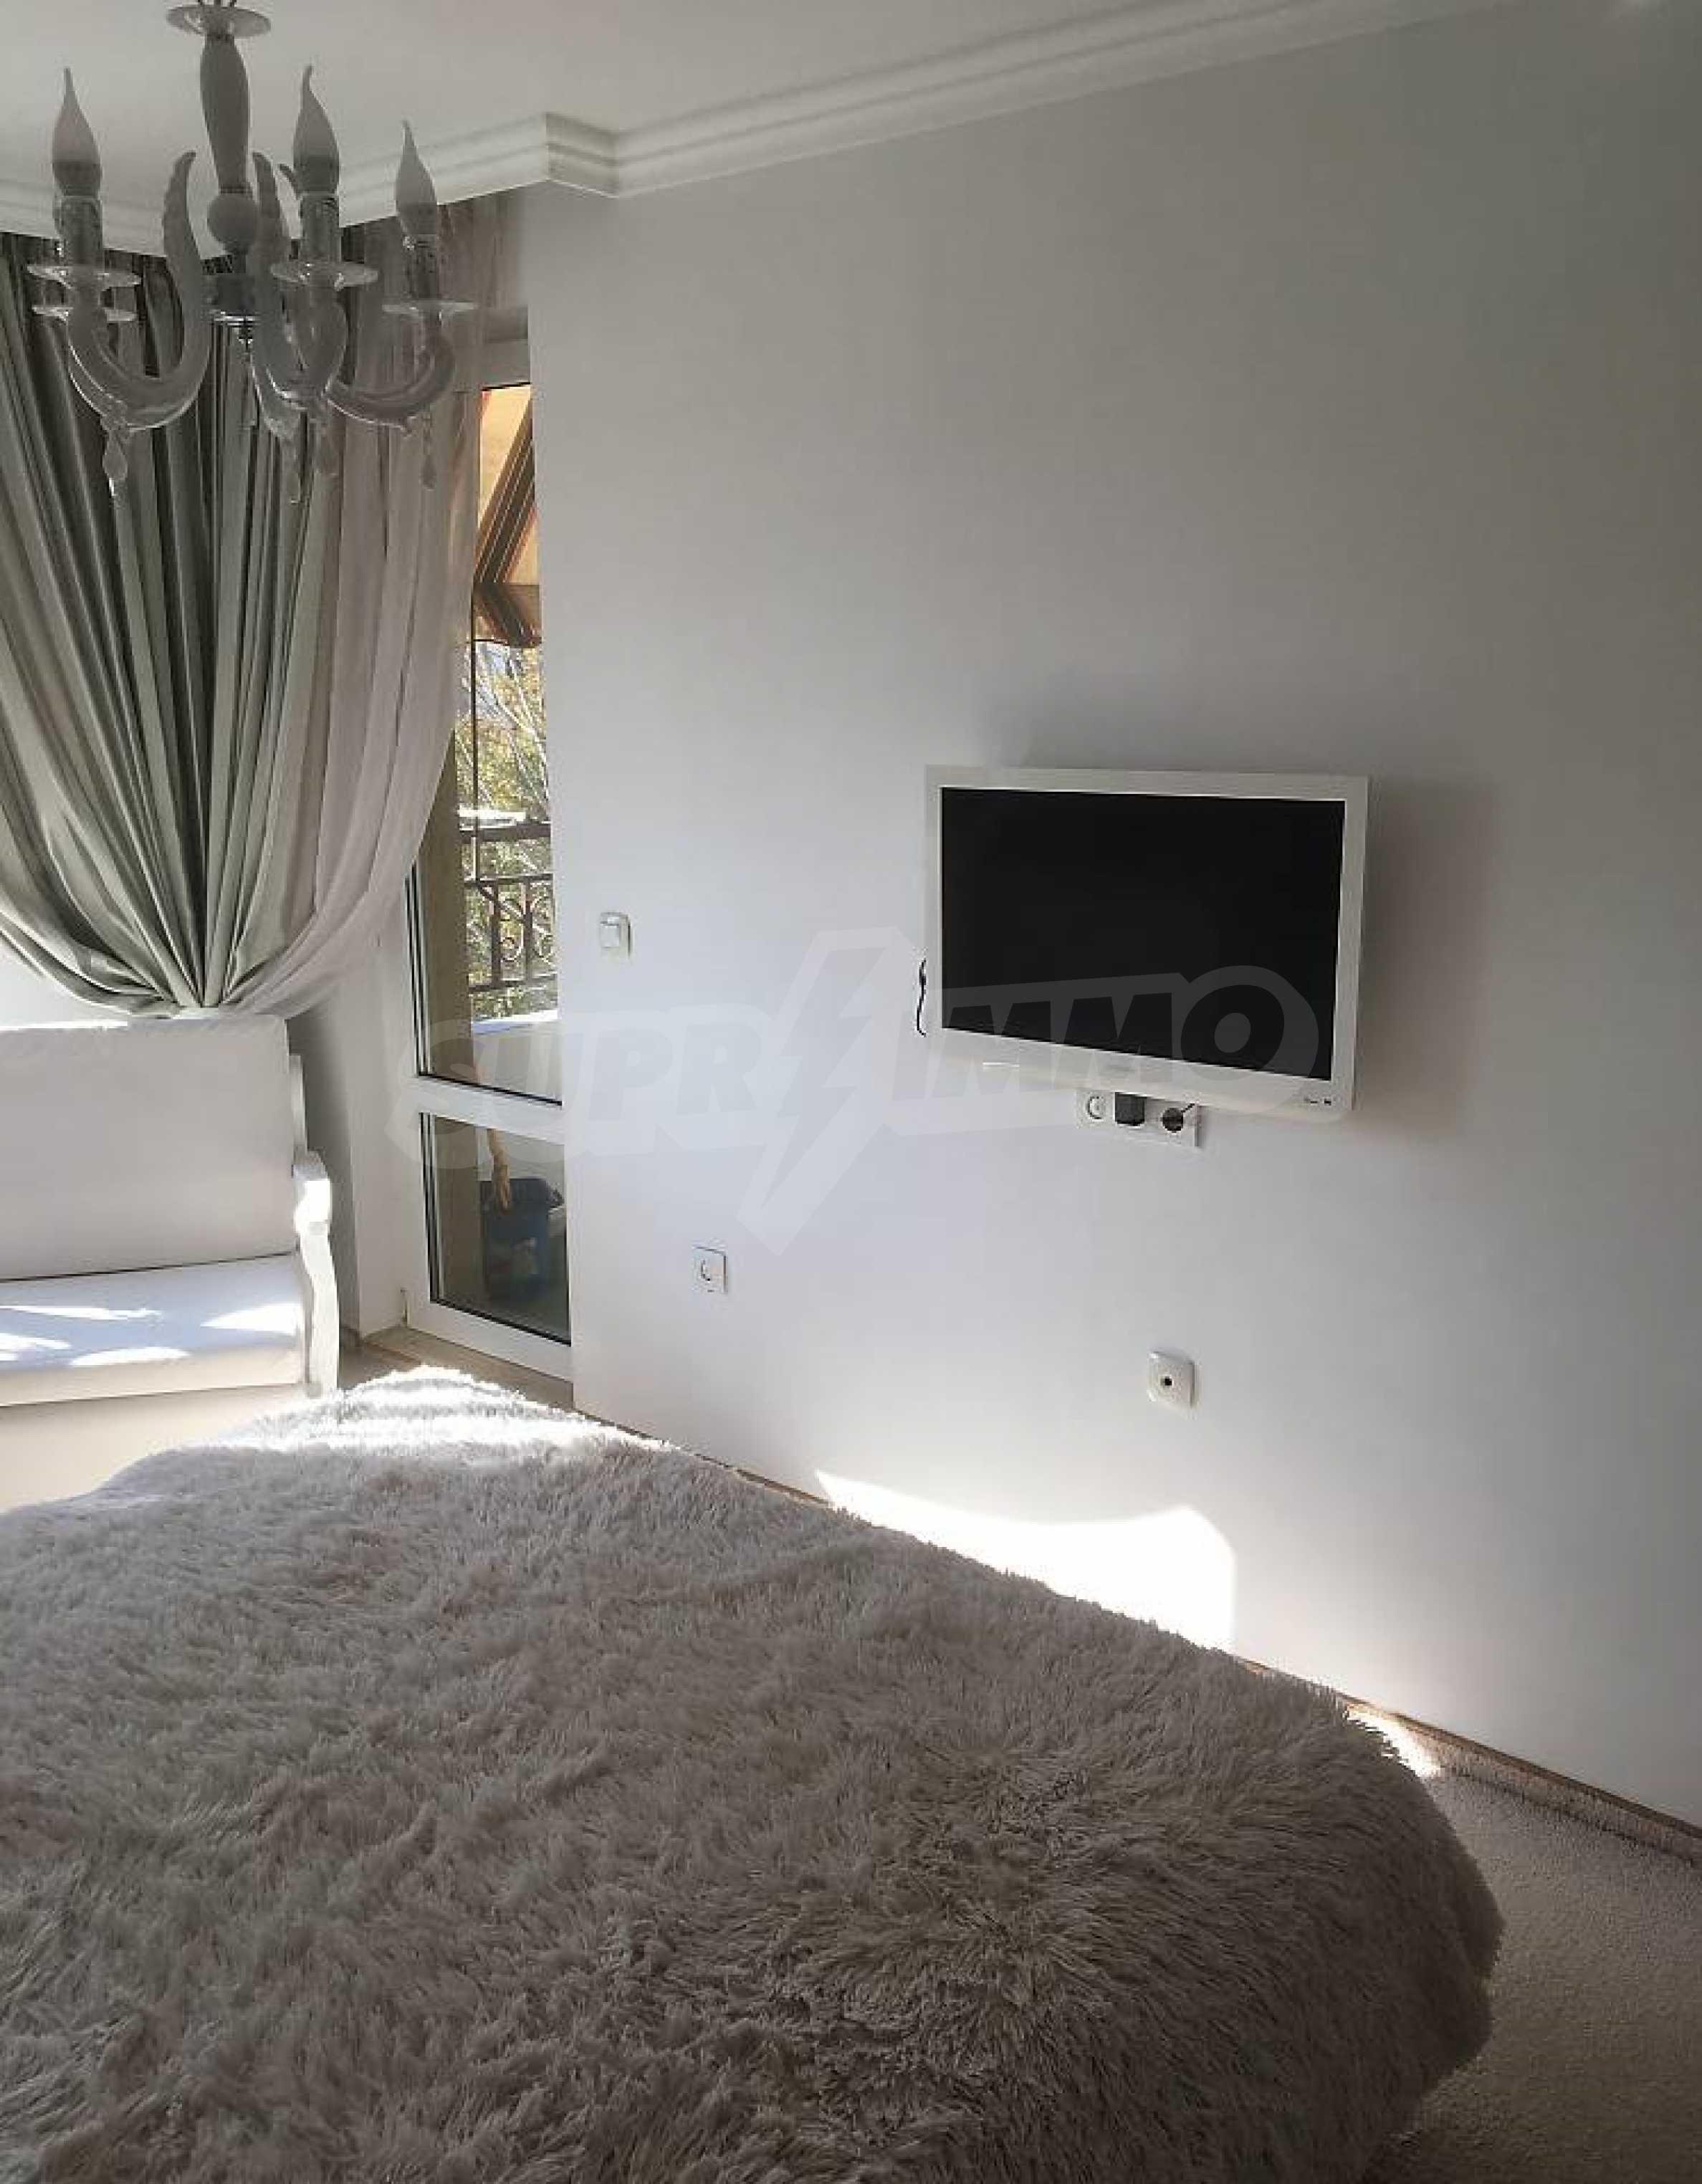 1-bedroom apartment in Burgas 5